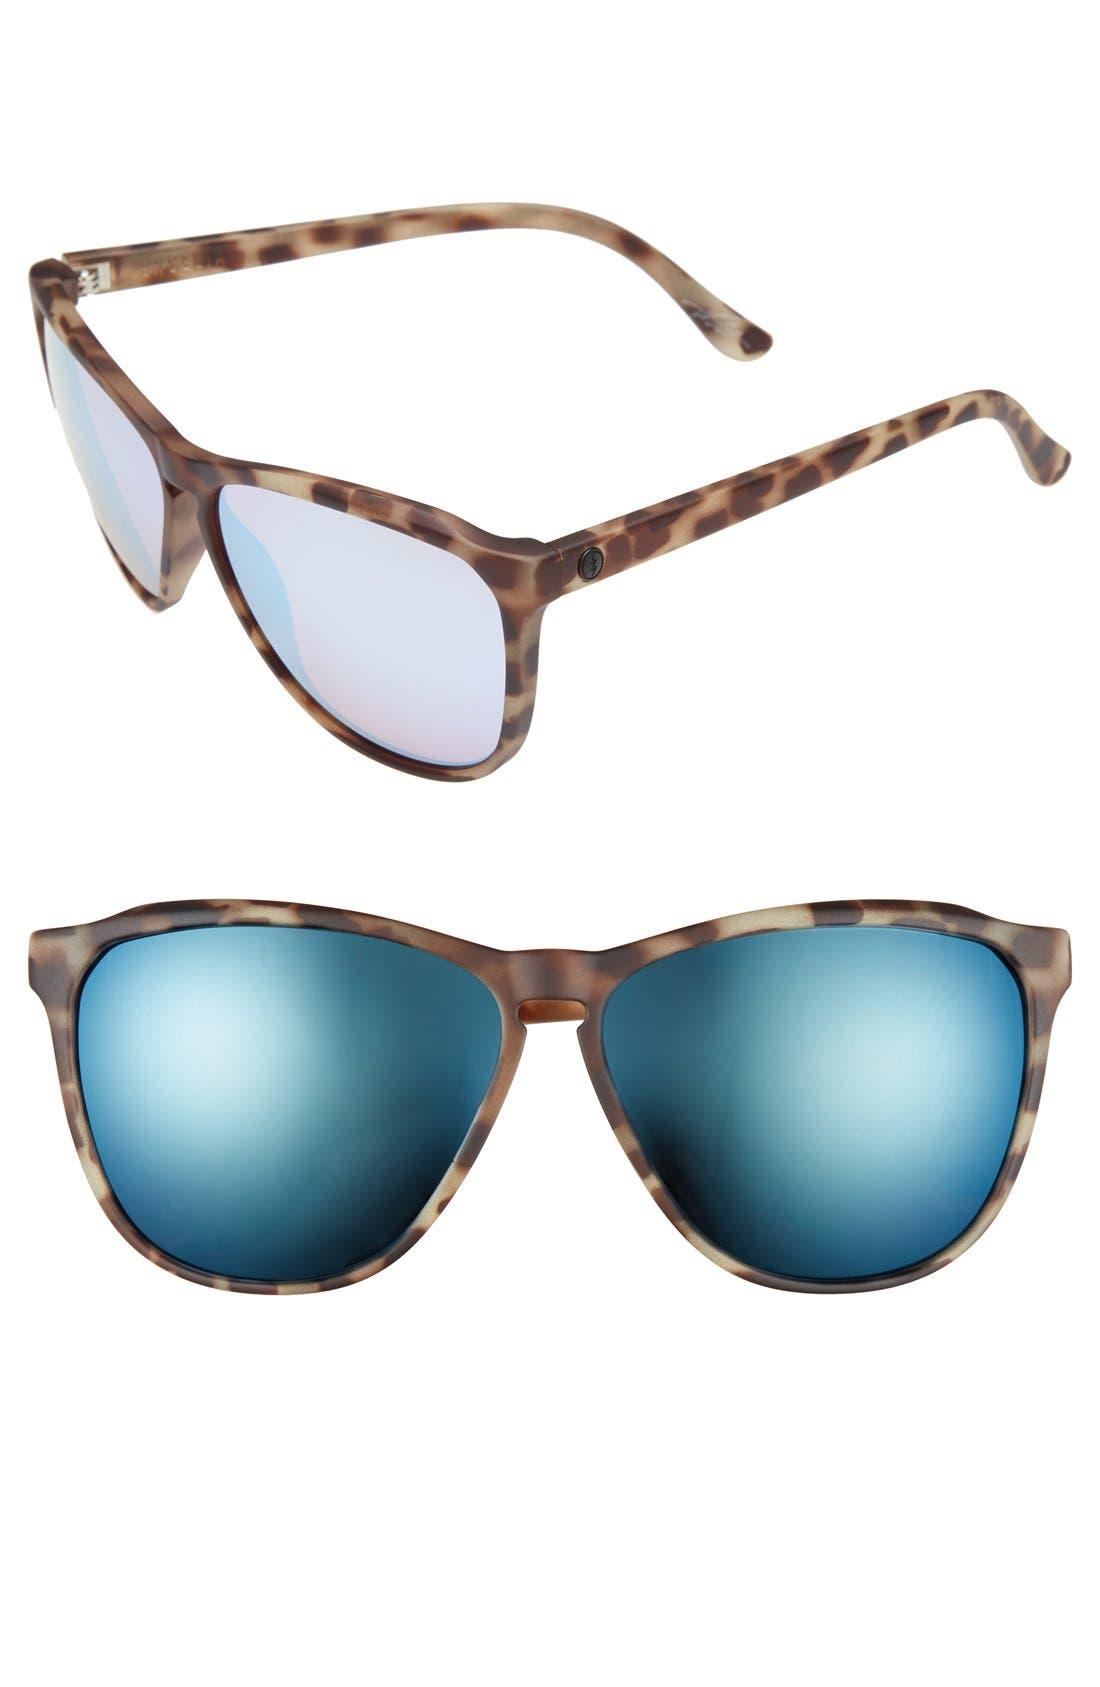 ELECTRIC 'Encelia' 61mm Retro Sunglasses